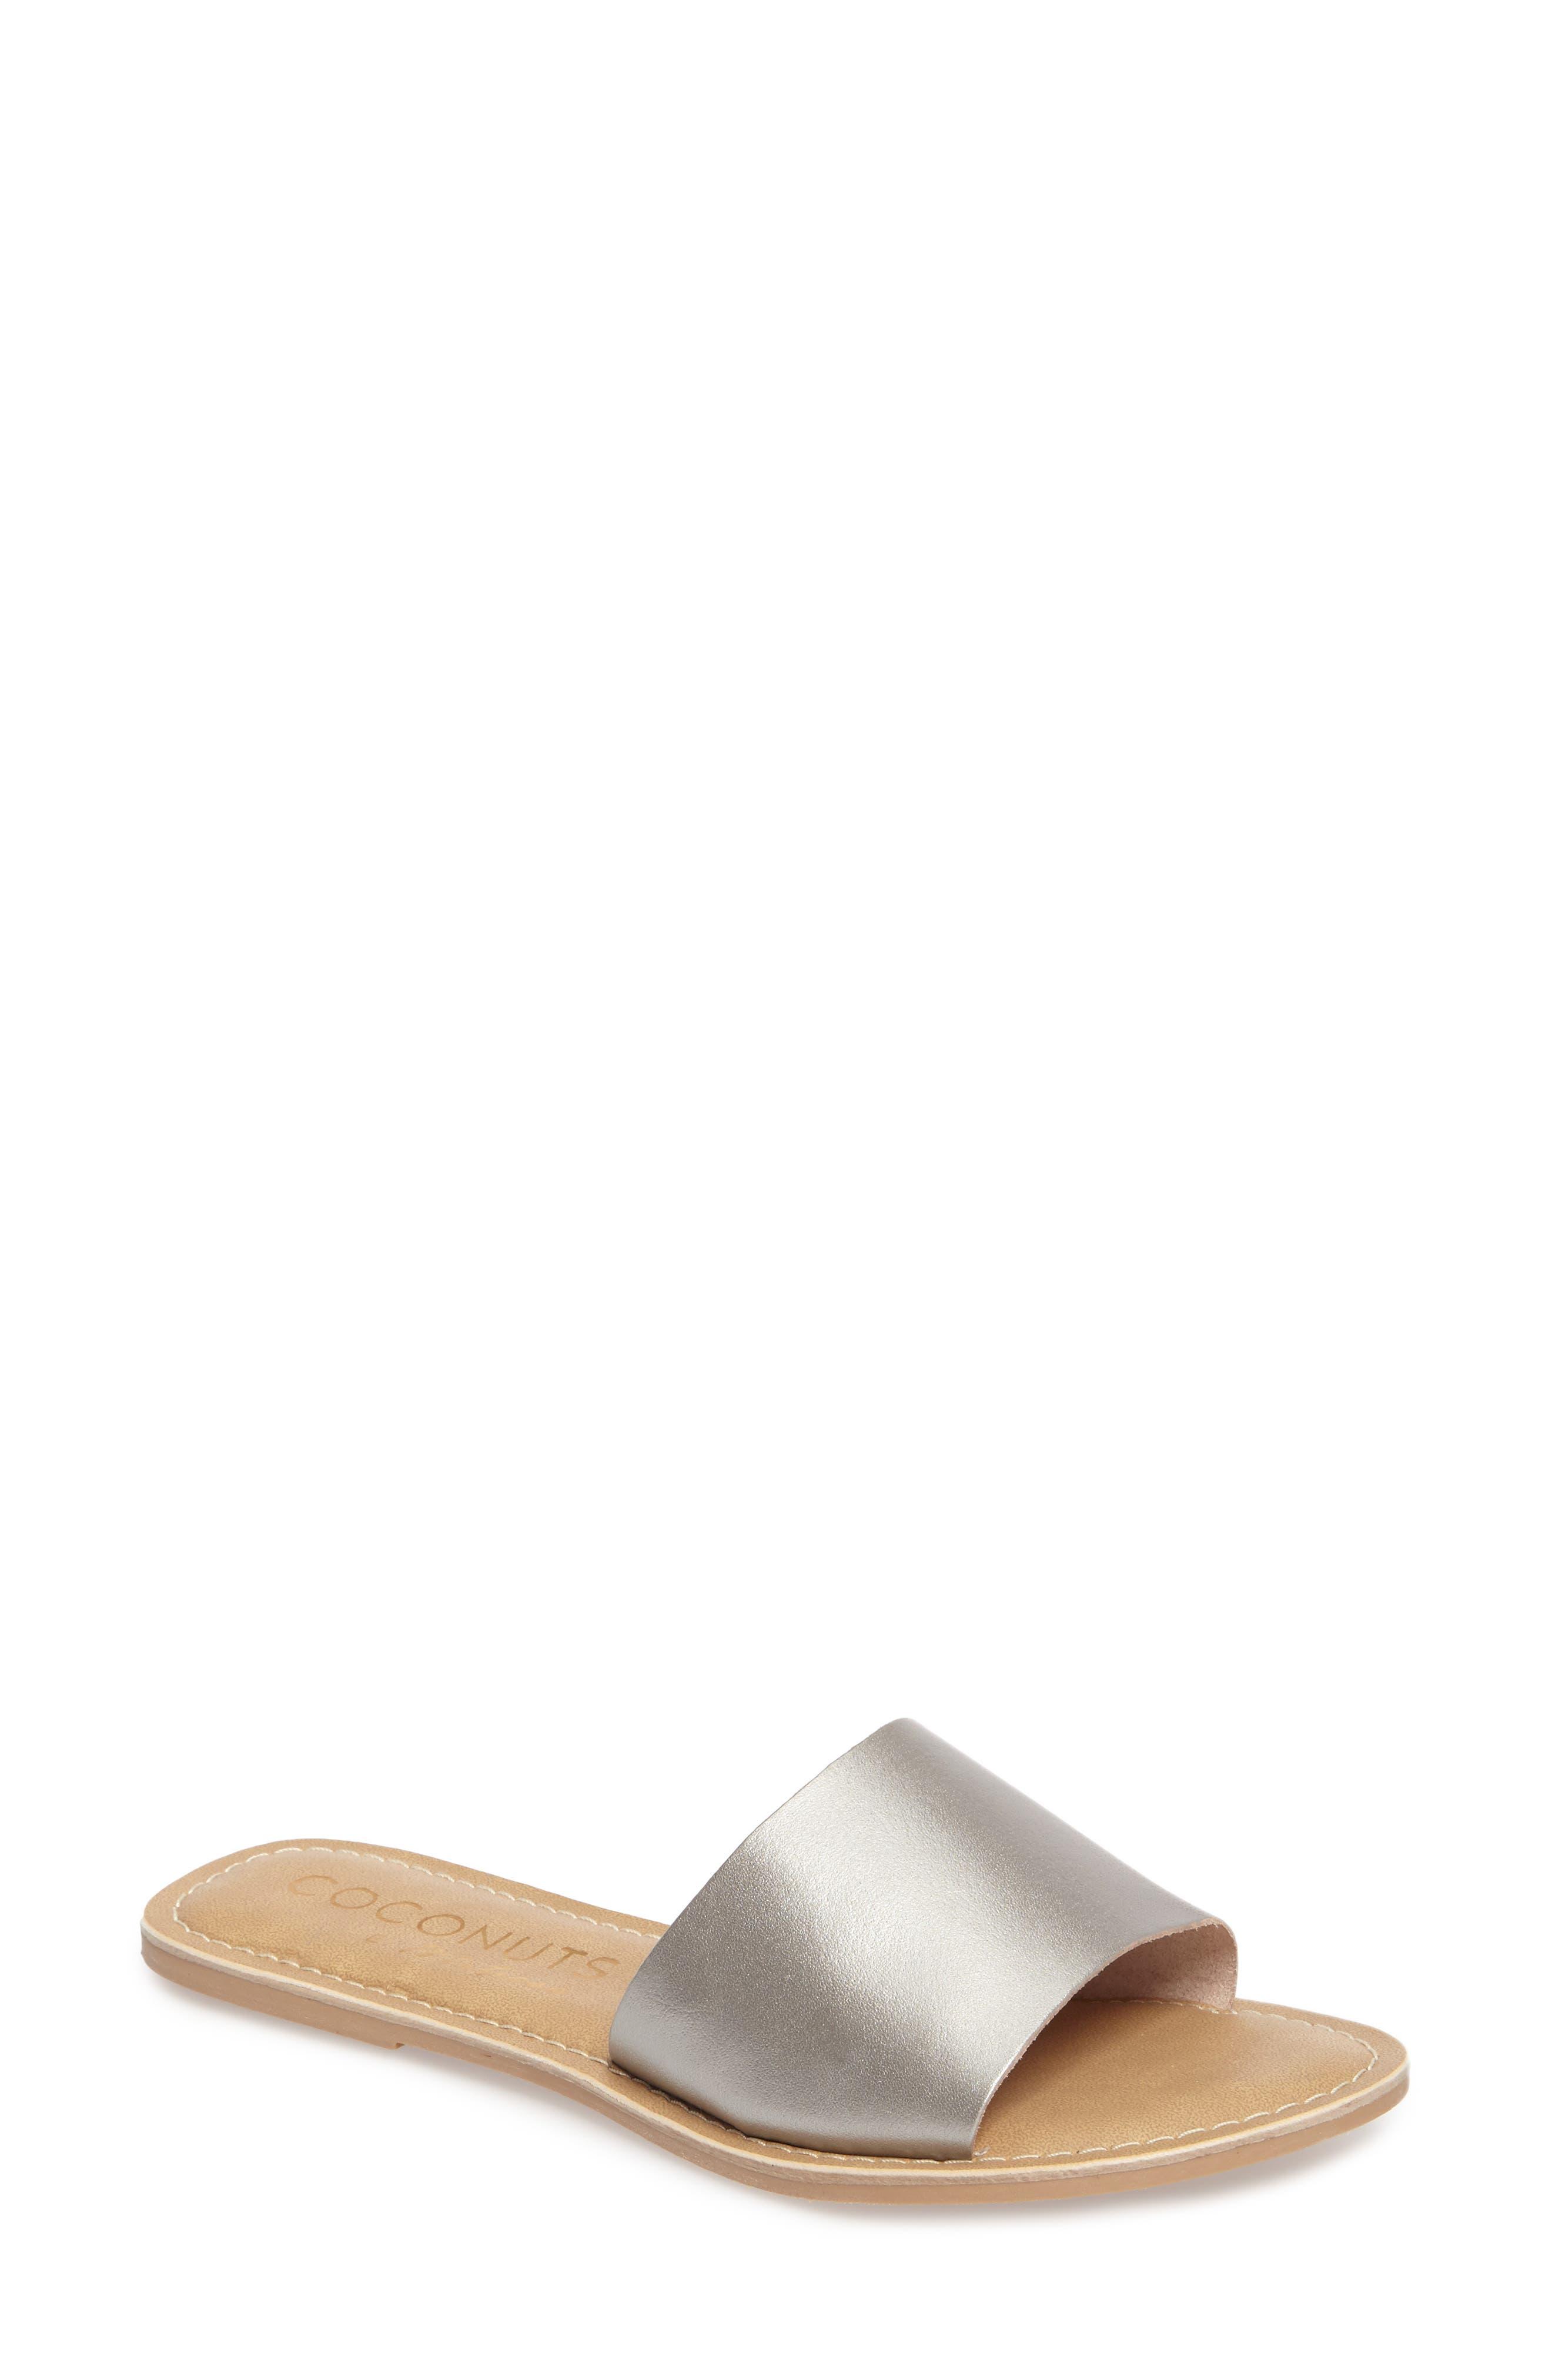 Cabana Slide Sandal,                         Main,                         color, Ice Leather